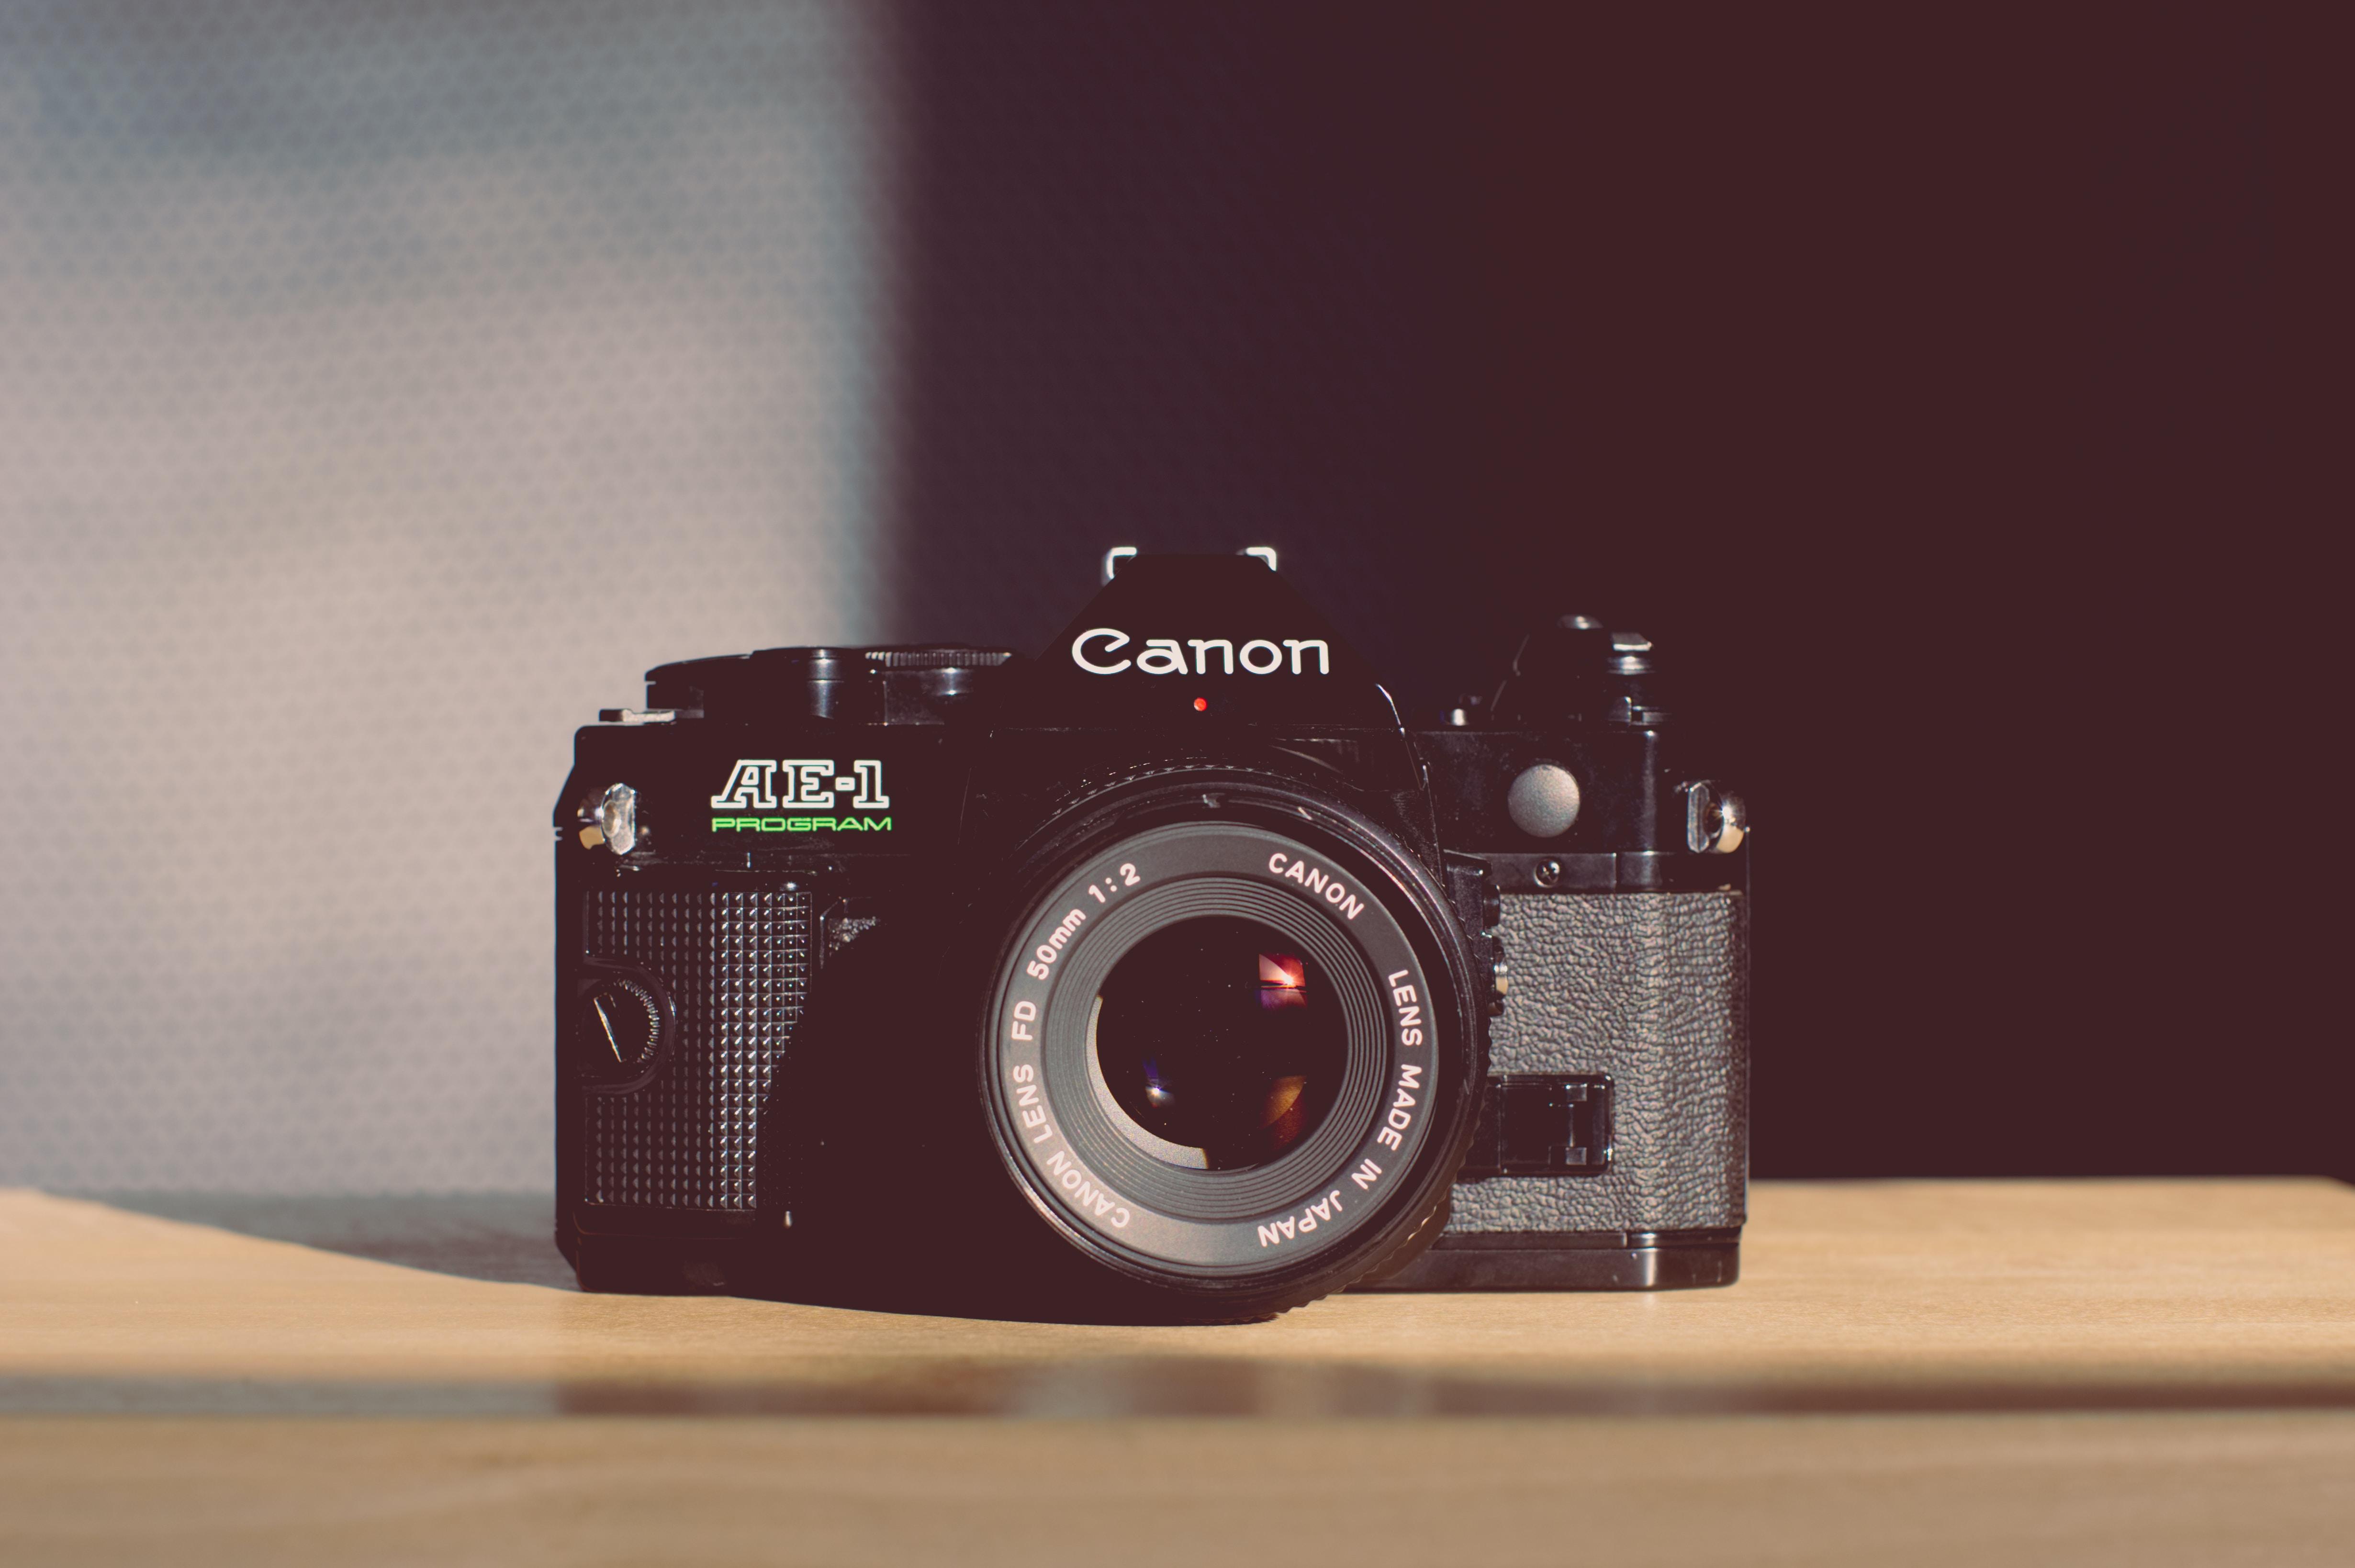 shallow focus photo of Canon camera